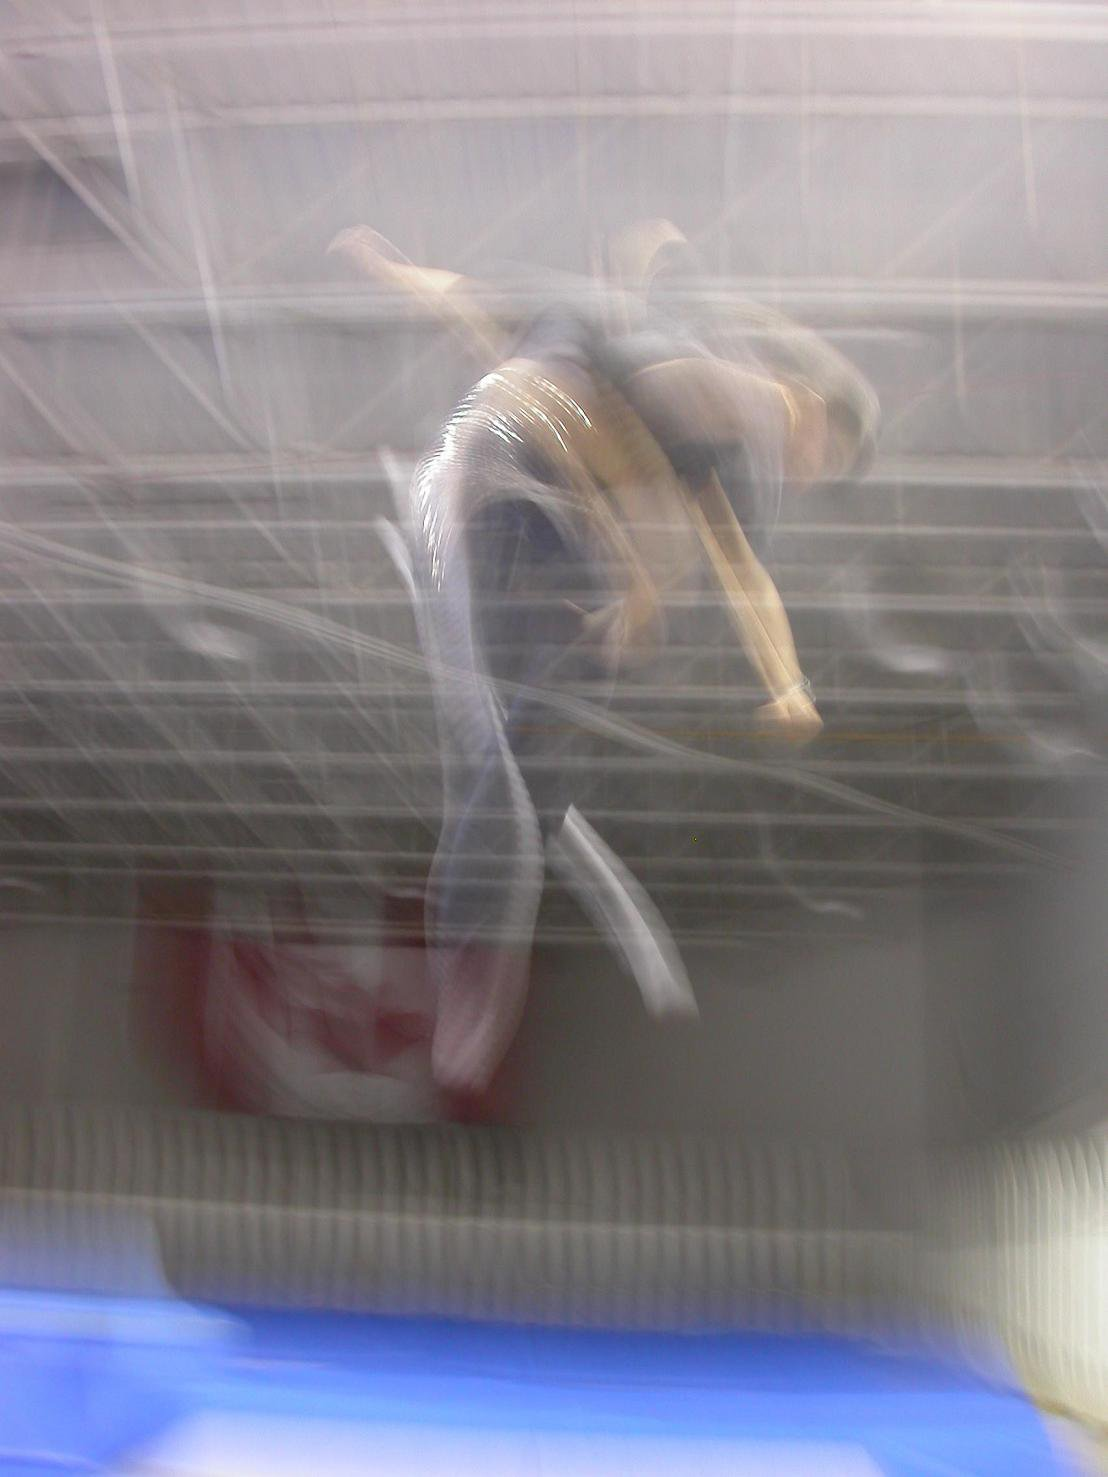 Cork 9 on tramp blurry style